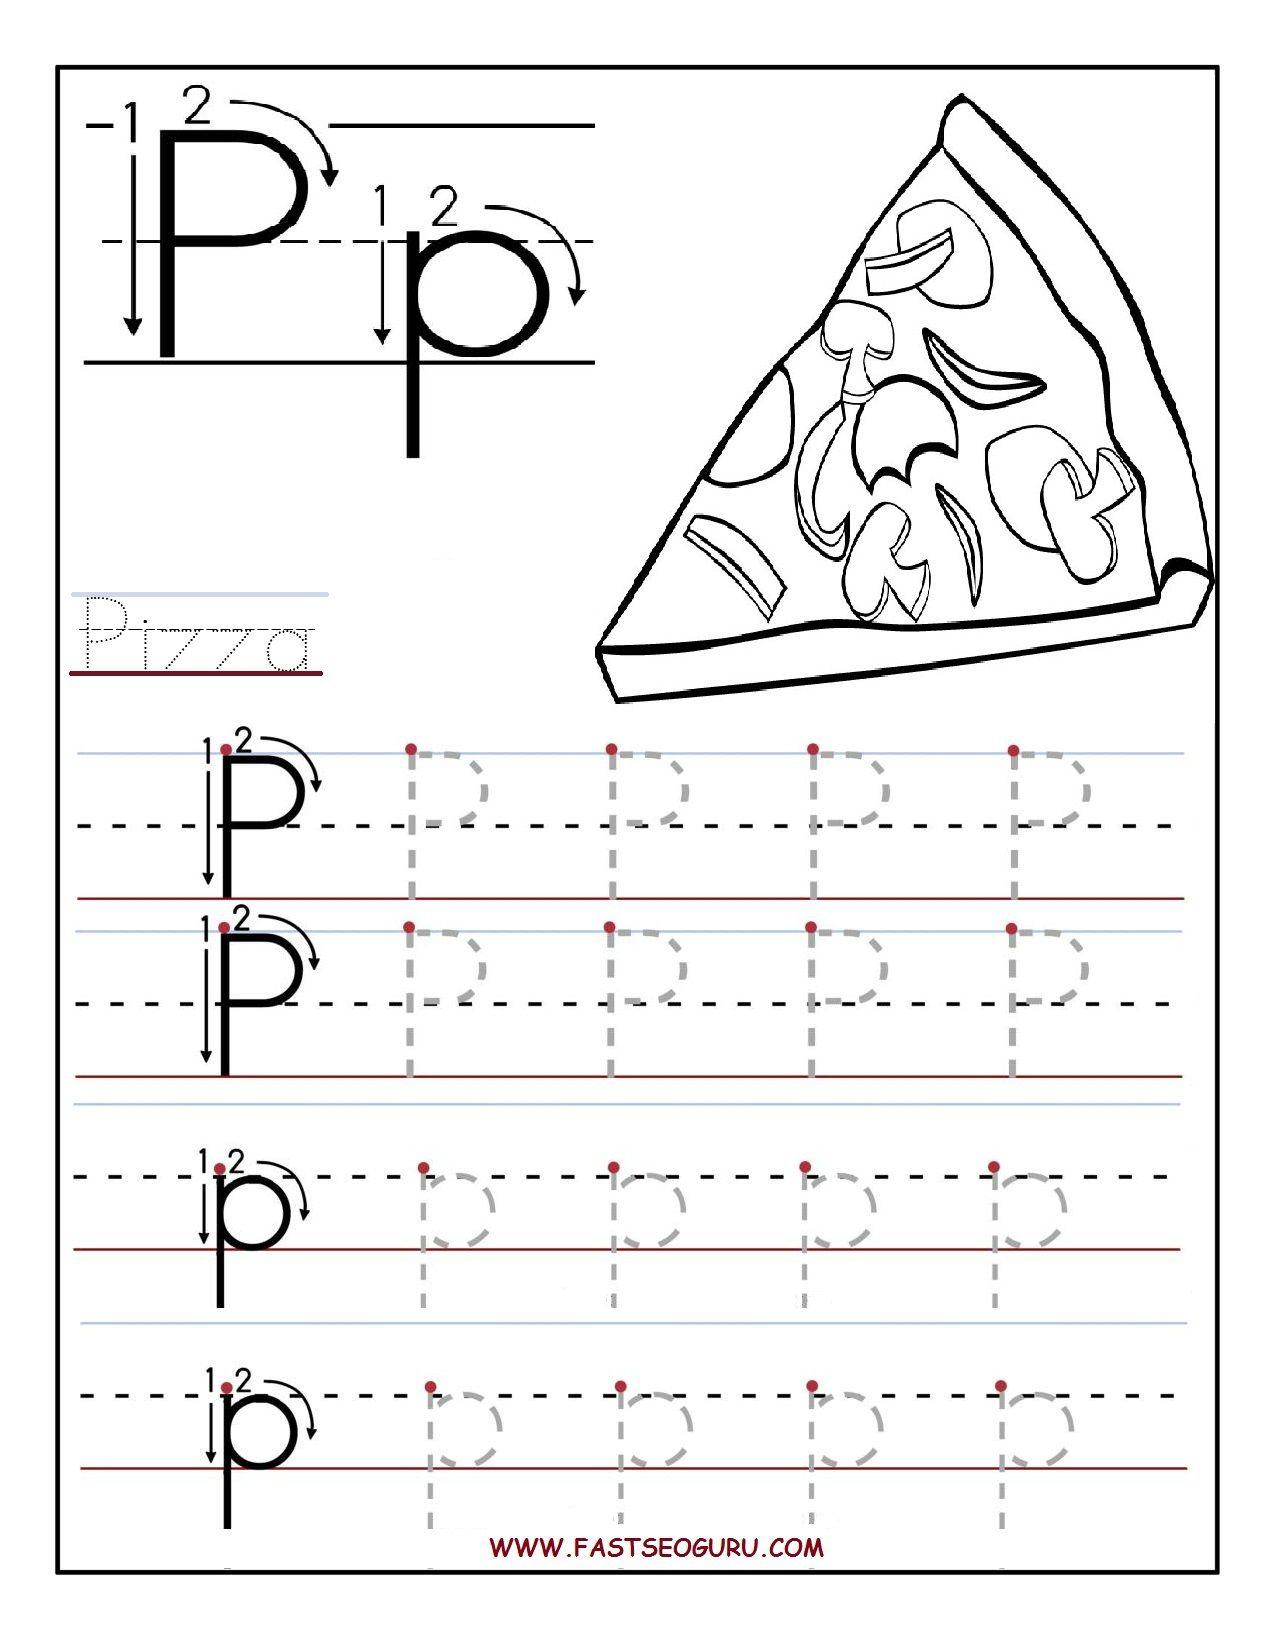 Pinvilfran Gason On Decor | Preschool Worksheets, Letter throughout Letter P Alphabet Worksheets